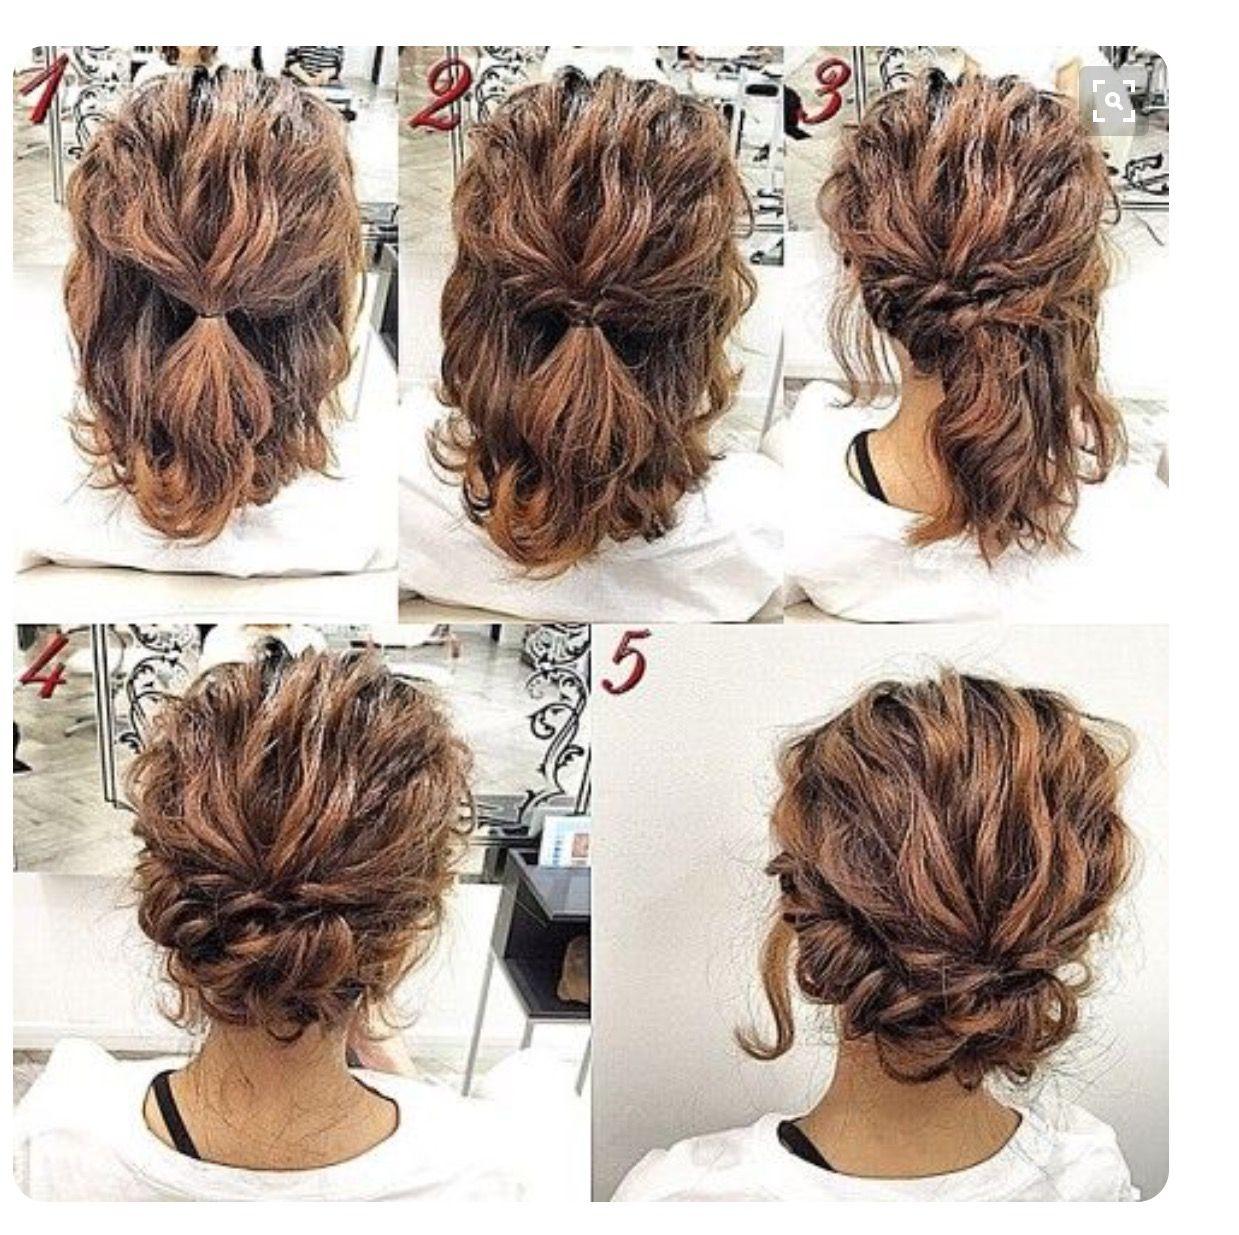 perfectly messy updo | fun hair stuff | short hair styles